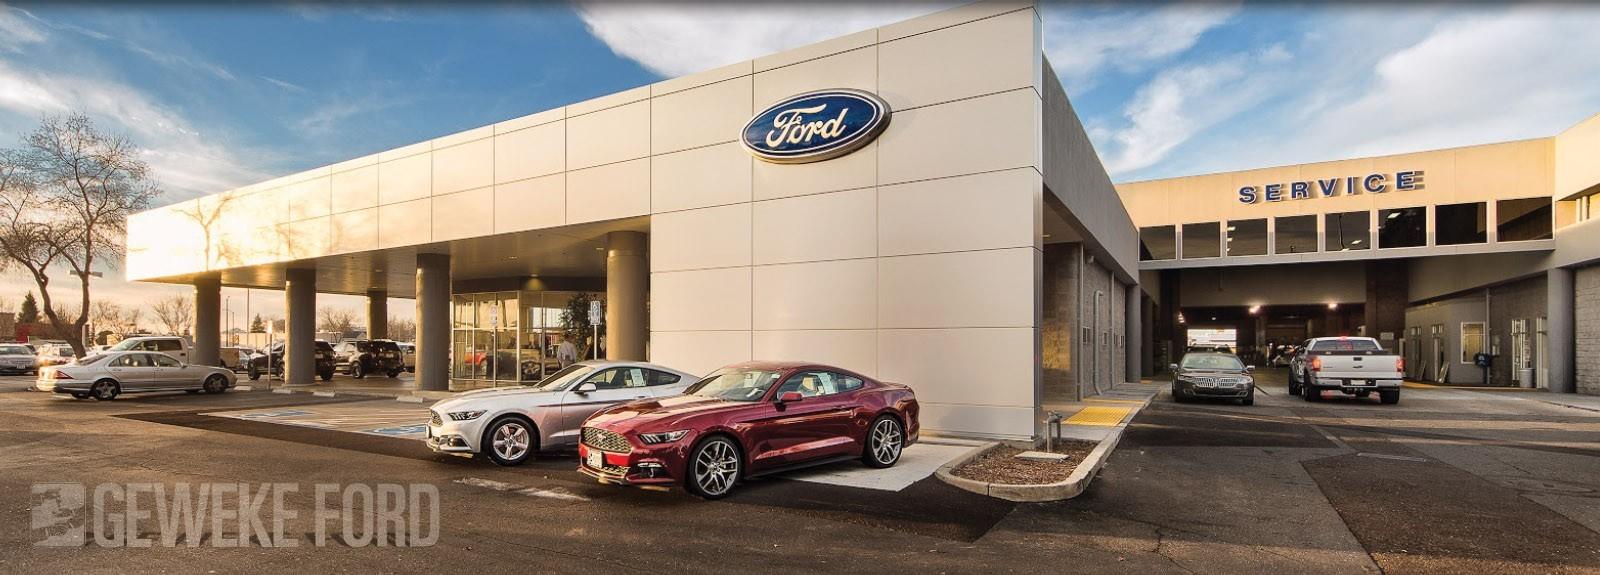 & Geweke | Ford Kia and Used Cars Yuba City | Car Dealer Yuba City markmcfarlin.com